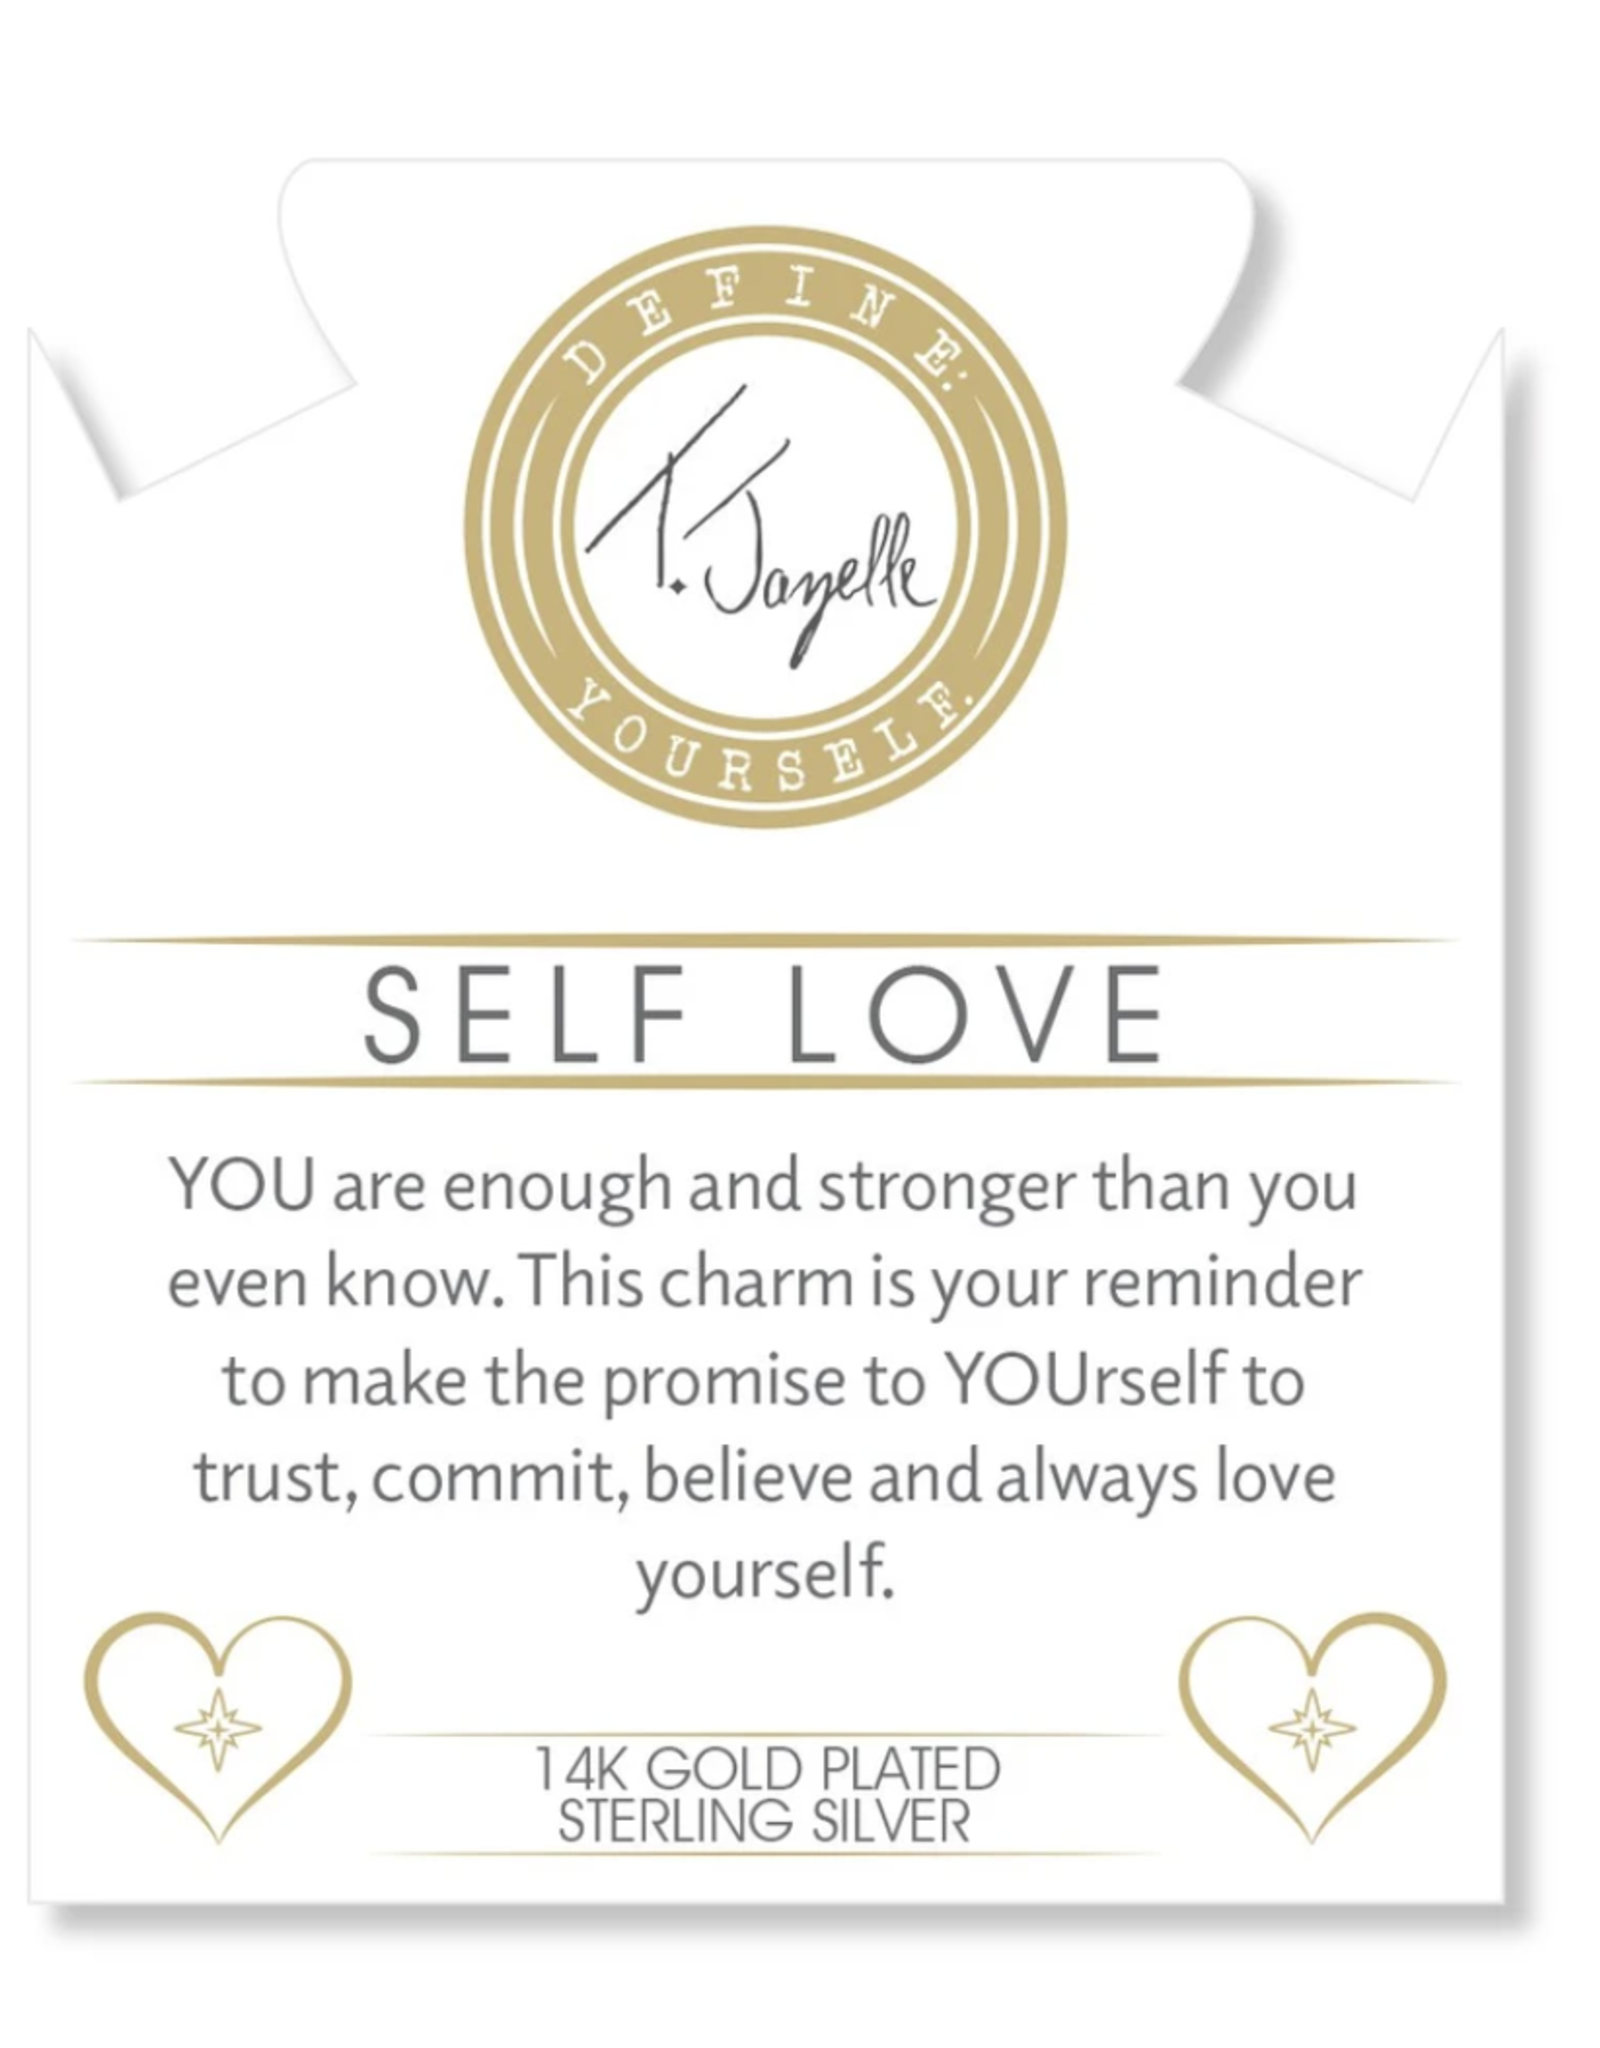 T. Jazelle T. Jazelle - Watermelon Quartz - Self Love - Gold